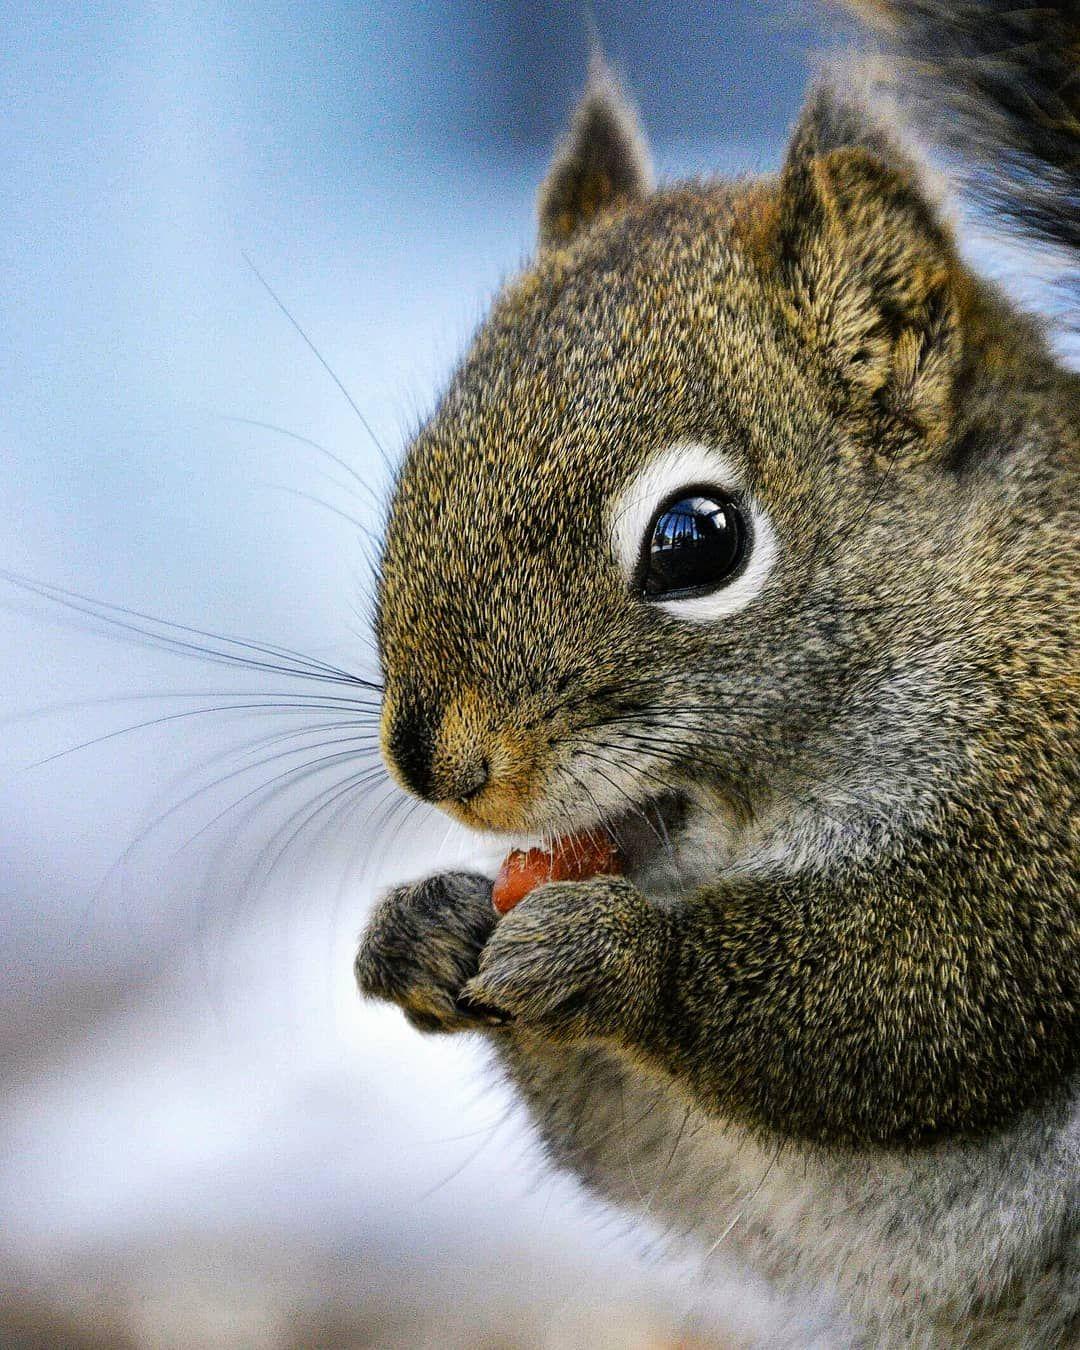 Wildlifephotography Naturelove Nature Adorable Cutest Cuteanimals Furryfriends Squirrel Furryfrie Cute Animals Images Animals Images Animals Beautiful